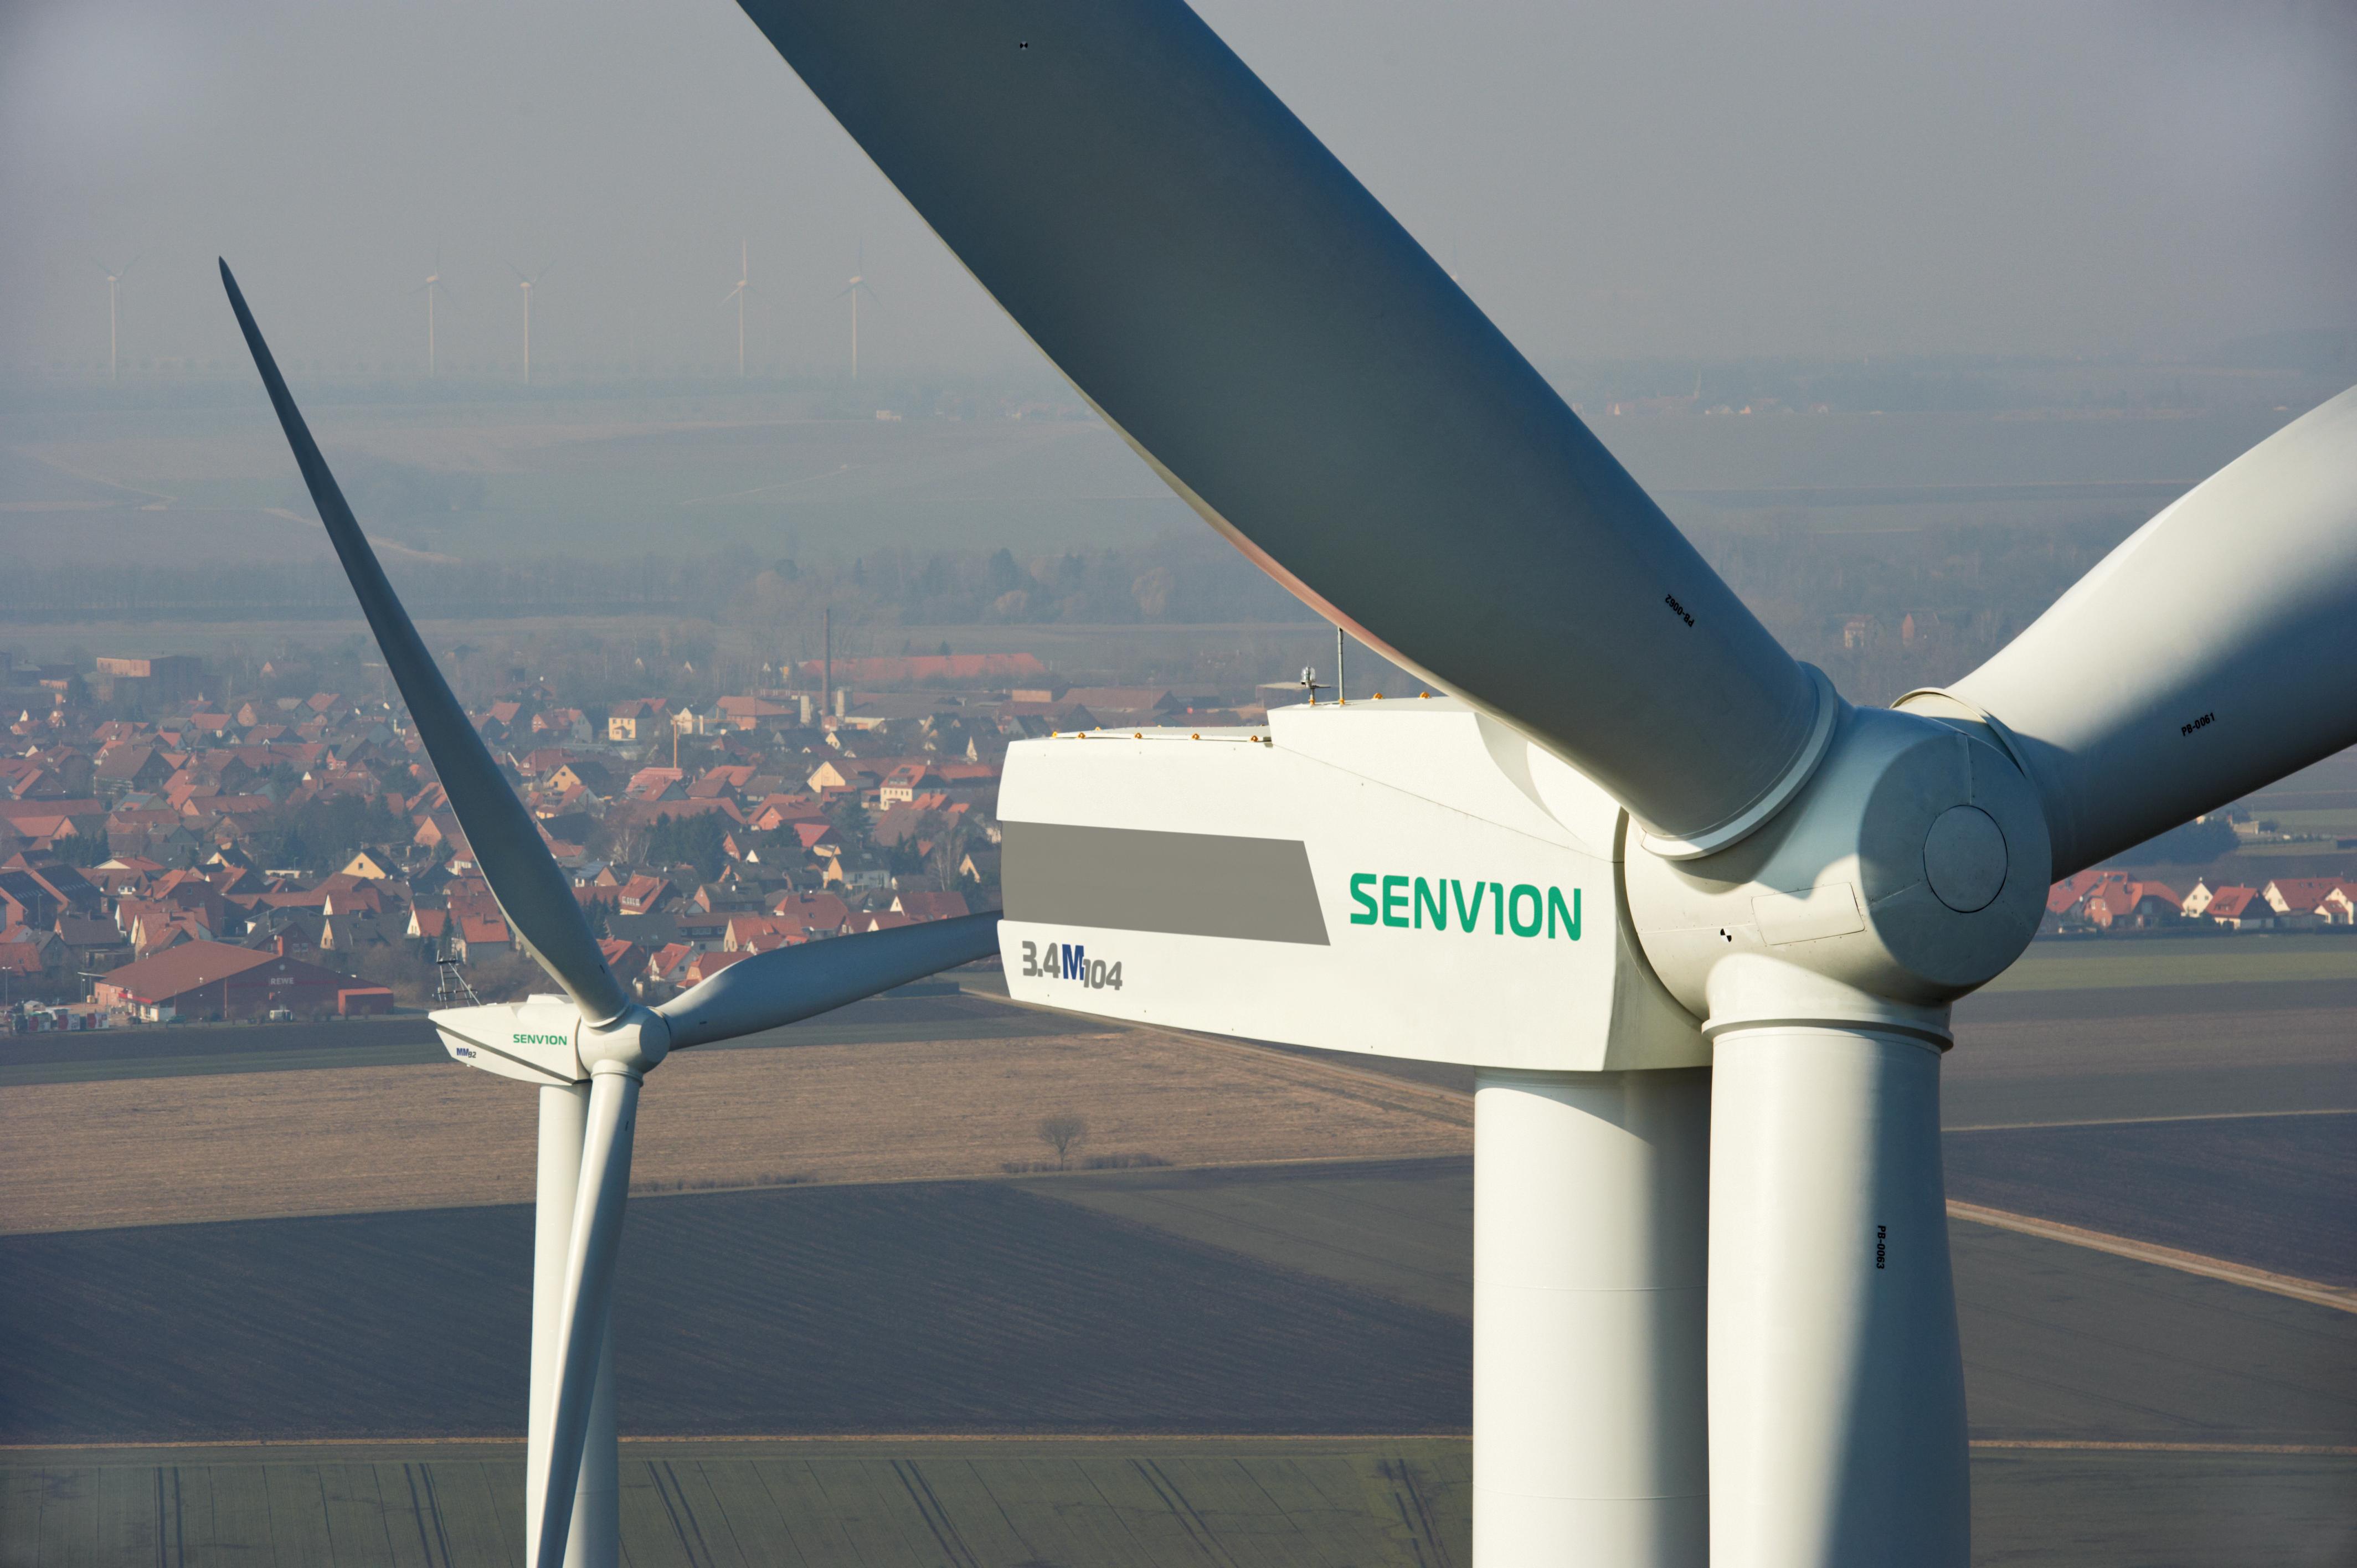 Senvion organiseert 100 miljoen Euro lening